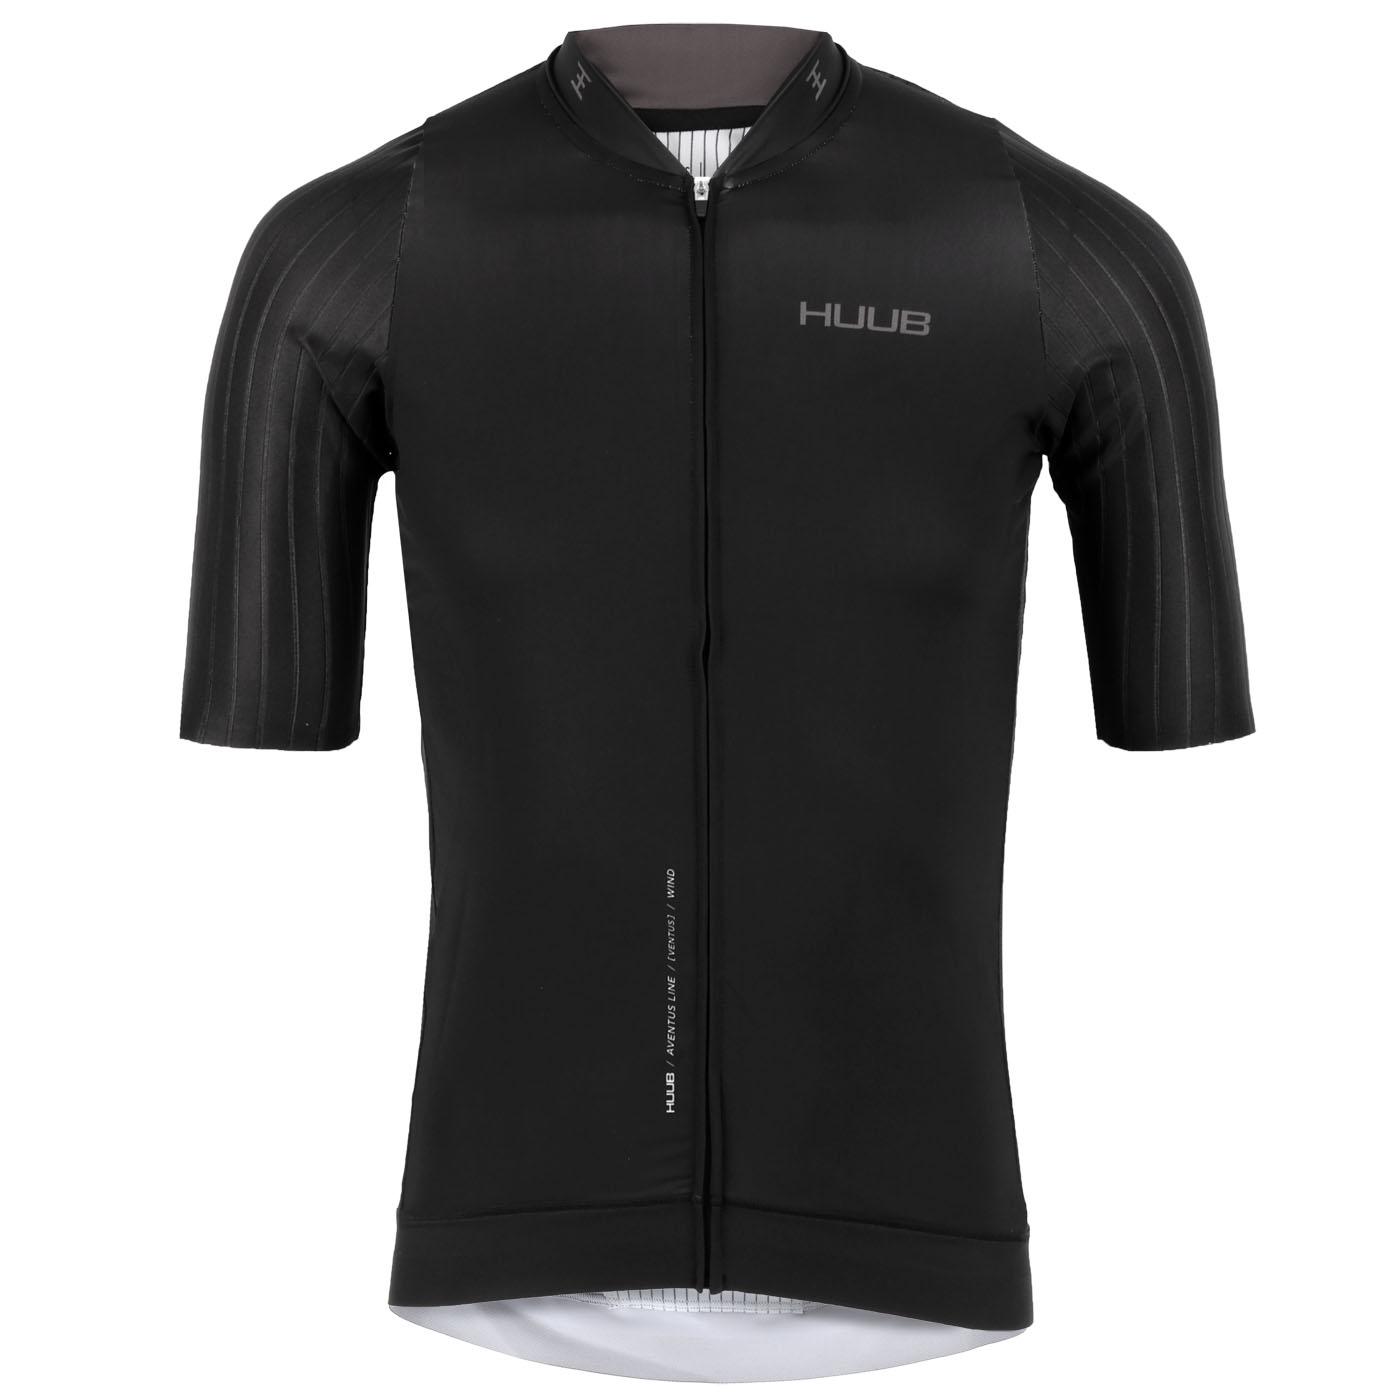 Produktbild von HUUB Design Aventus Cycle Kurzarm-Trikot - schwarz/charcoal